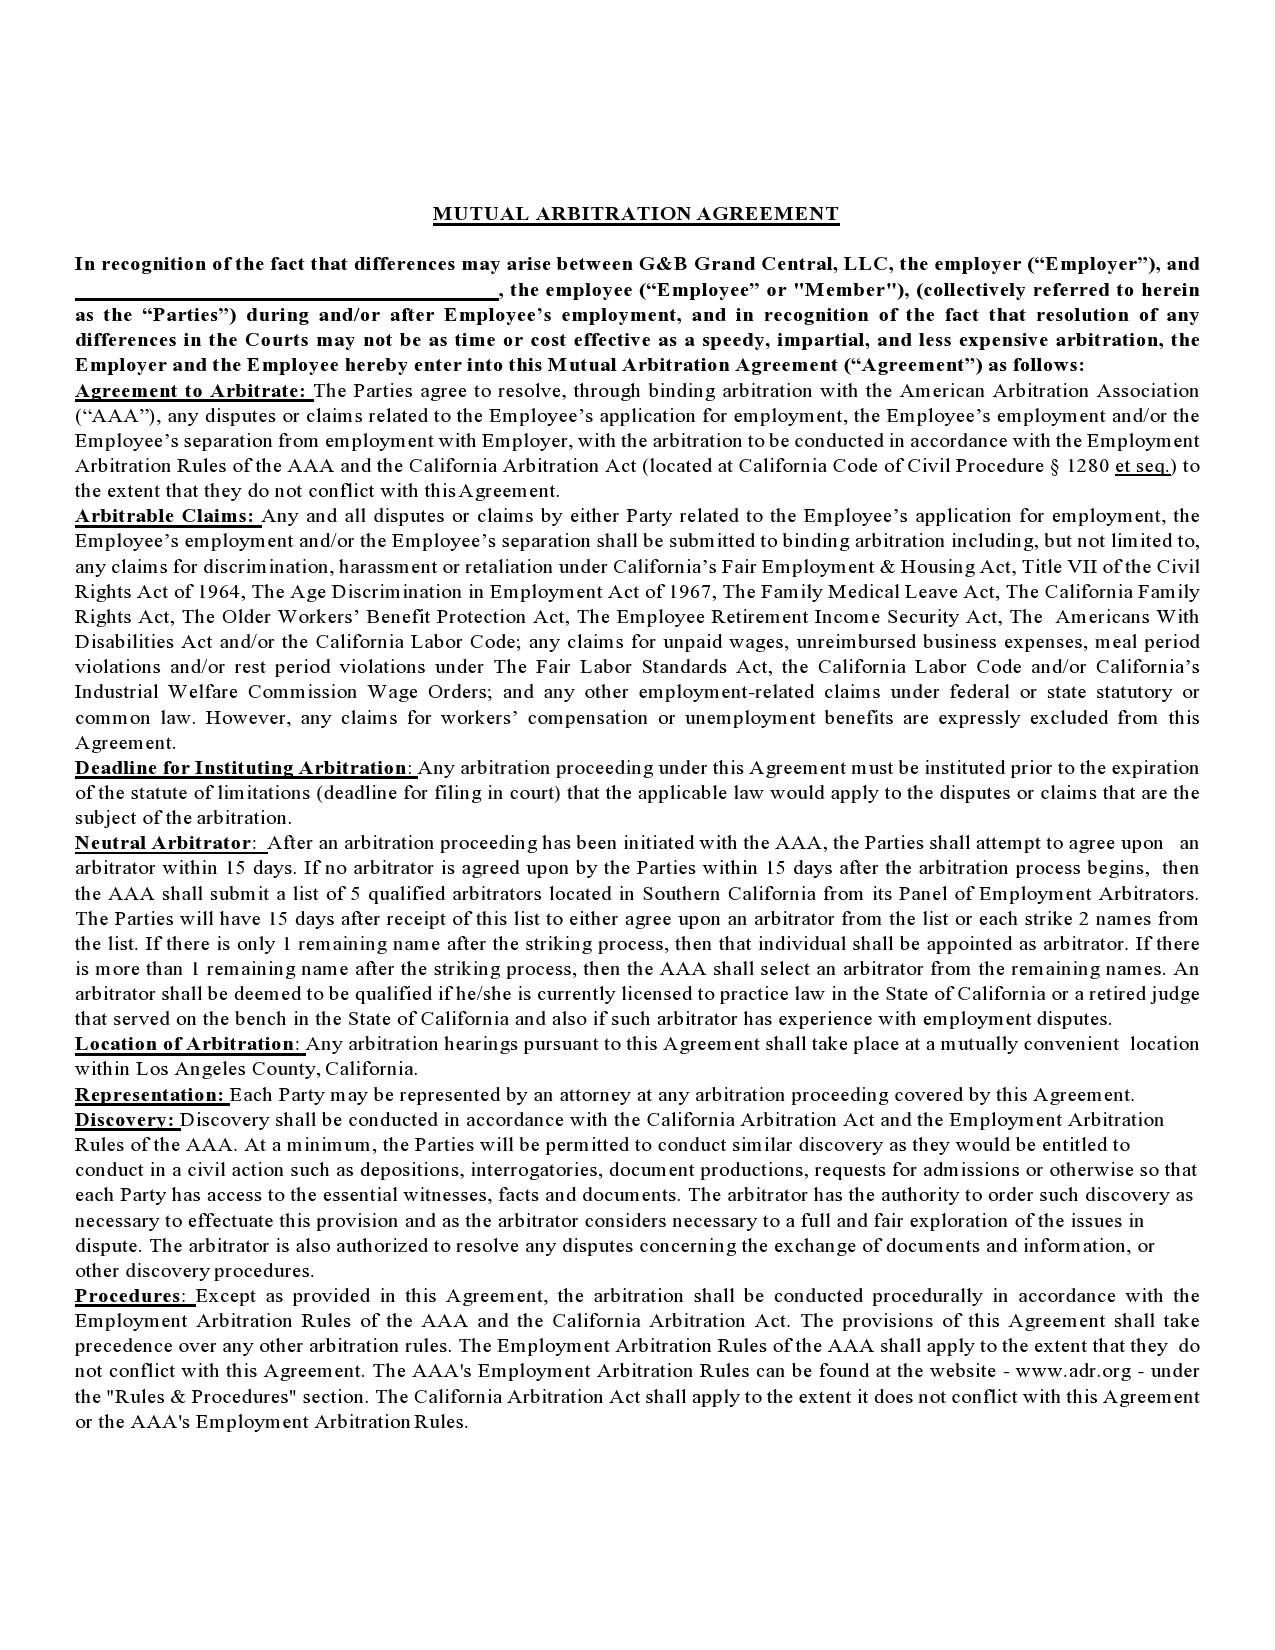 Free arbitration agreement 19